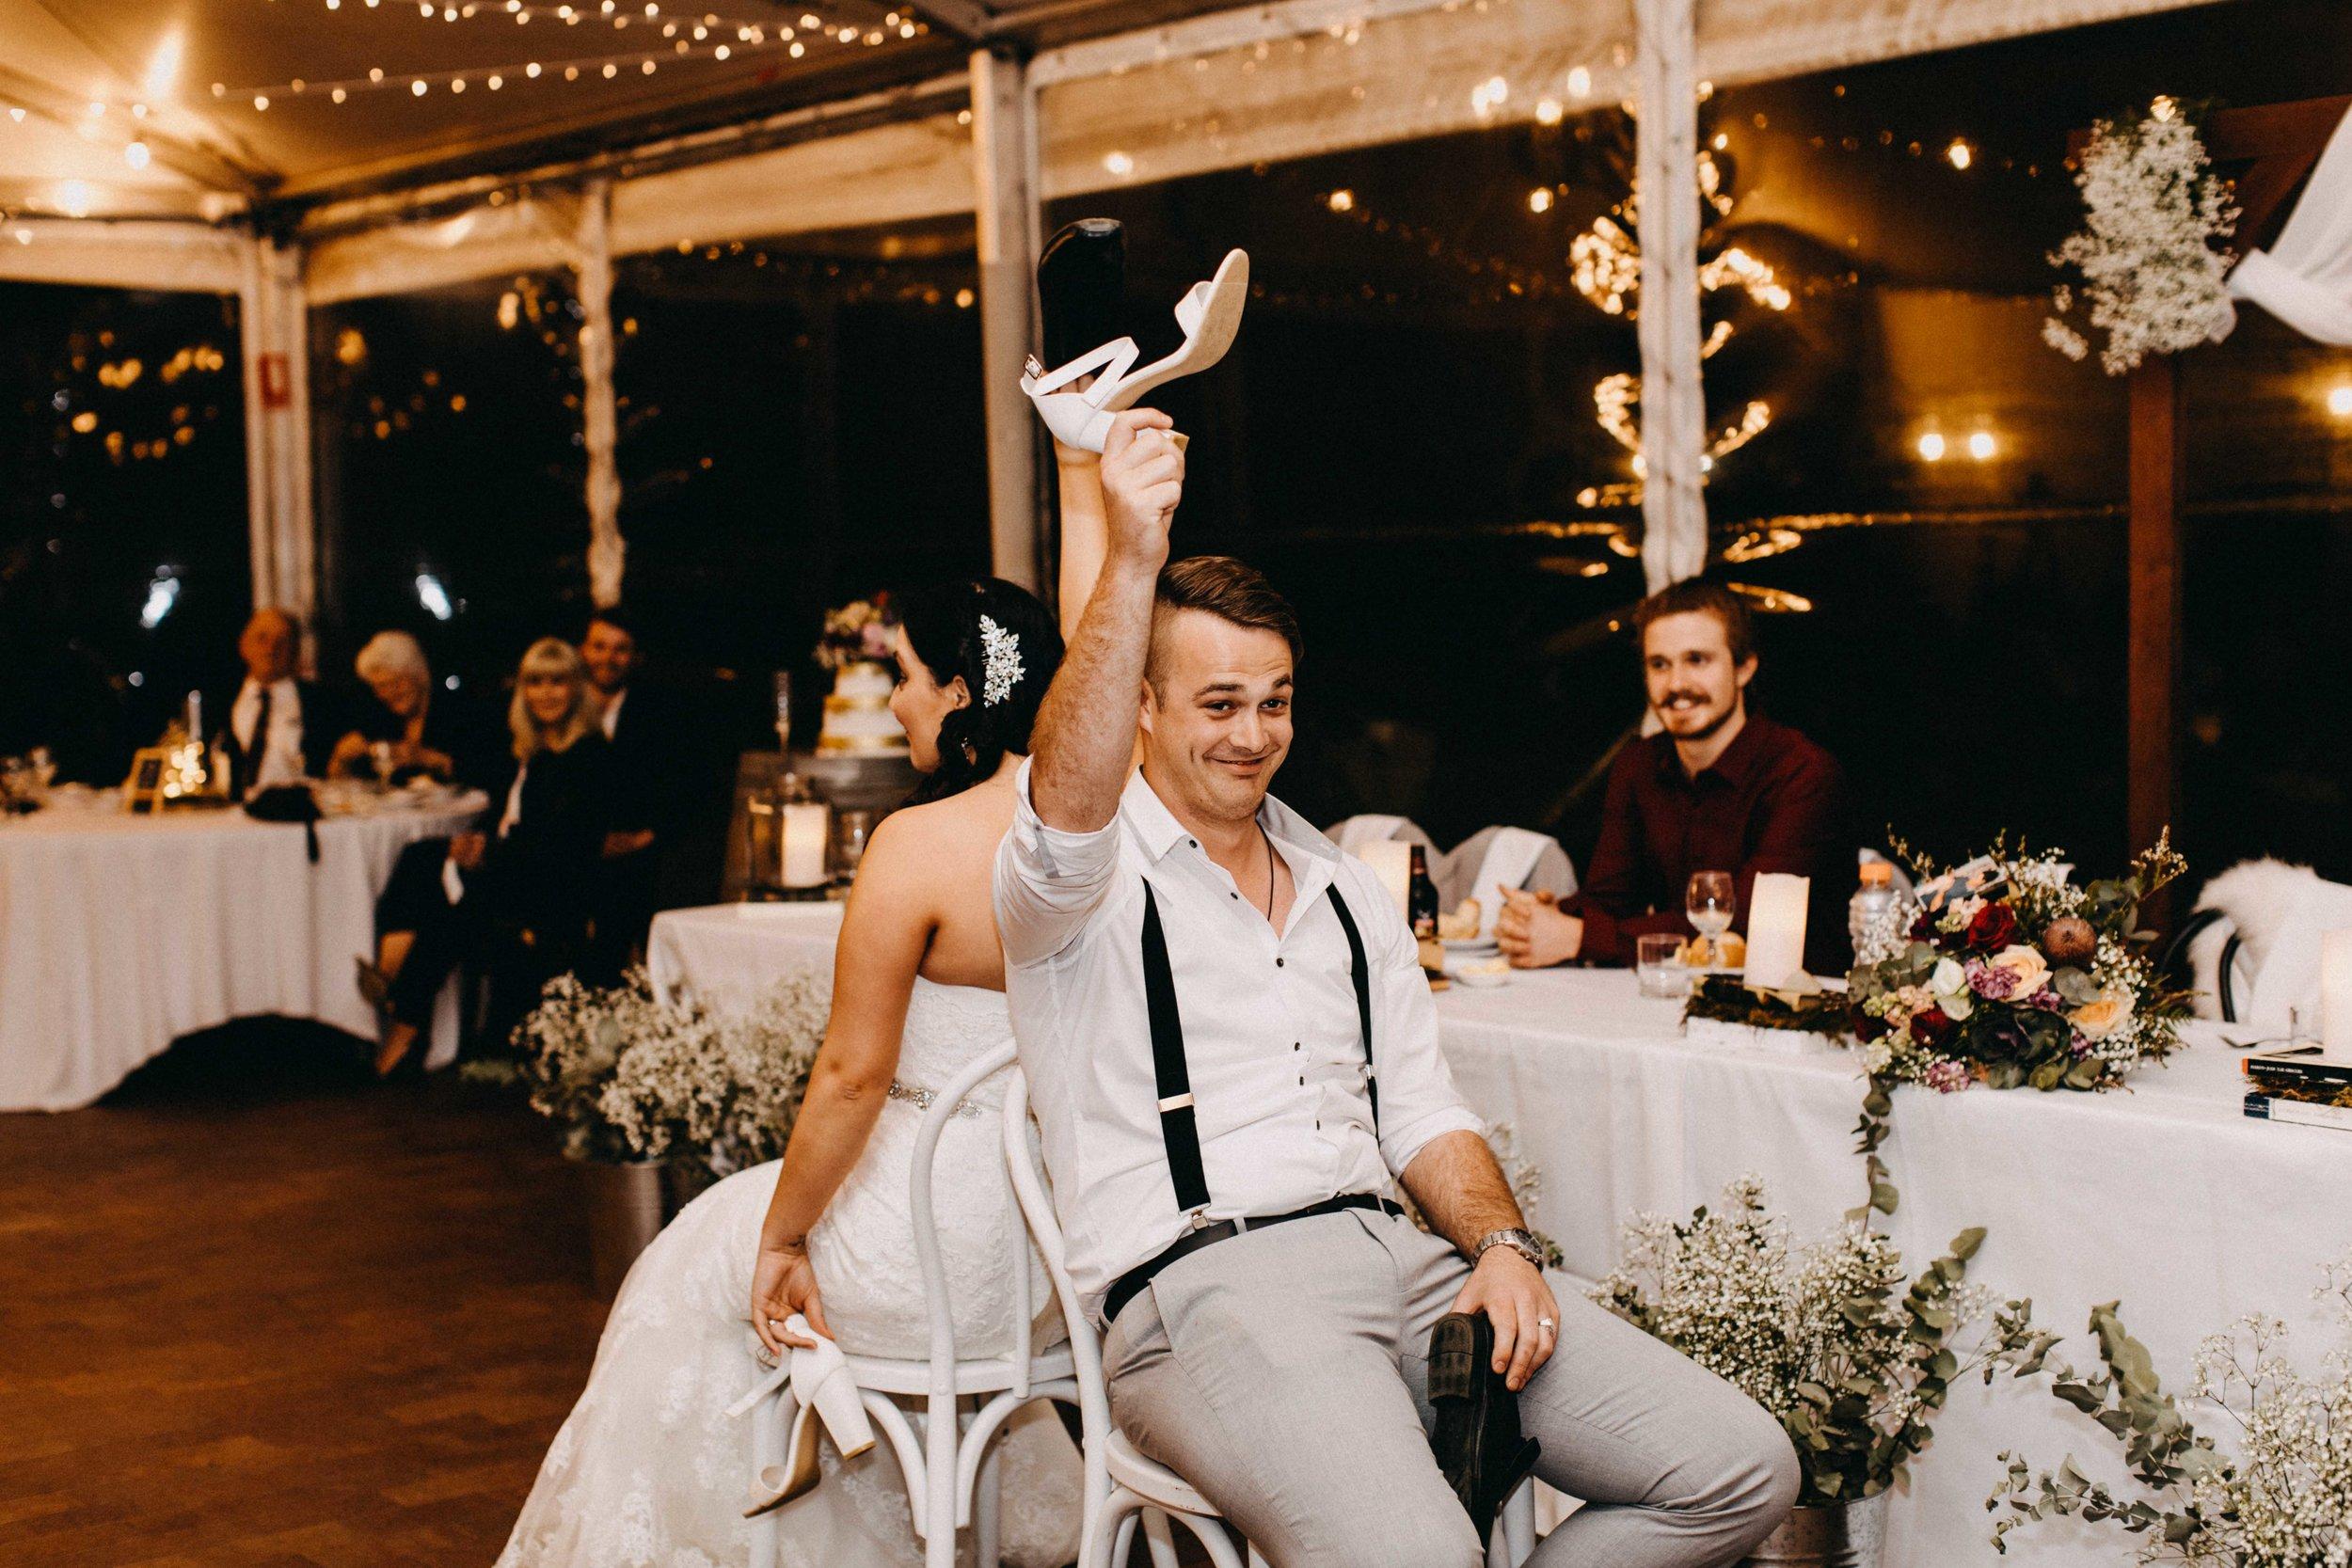 burnham-grove-camden-wedding-emilyobrienphotography-macarthur-150.jpg